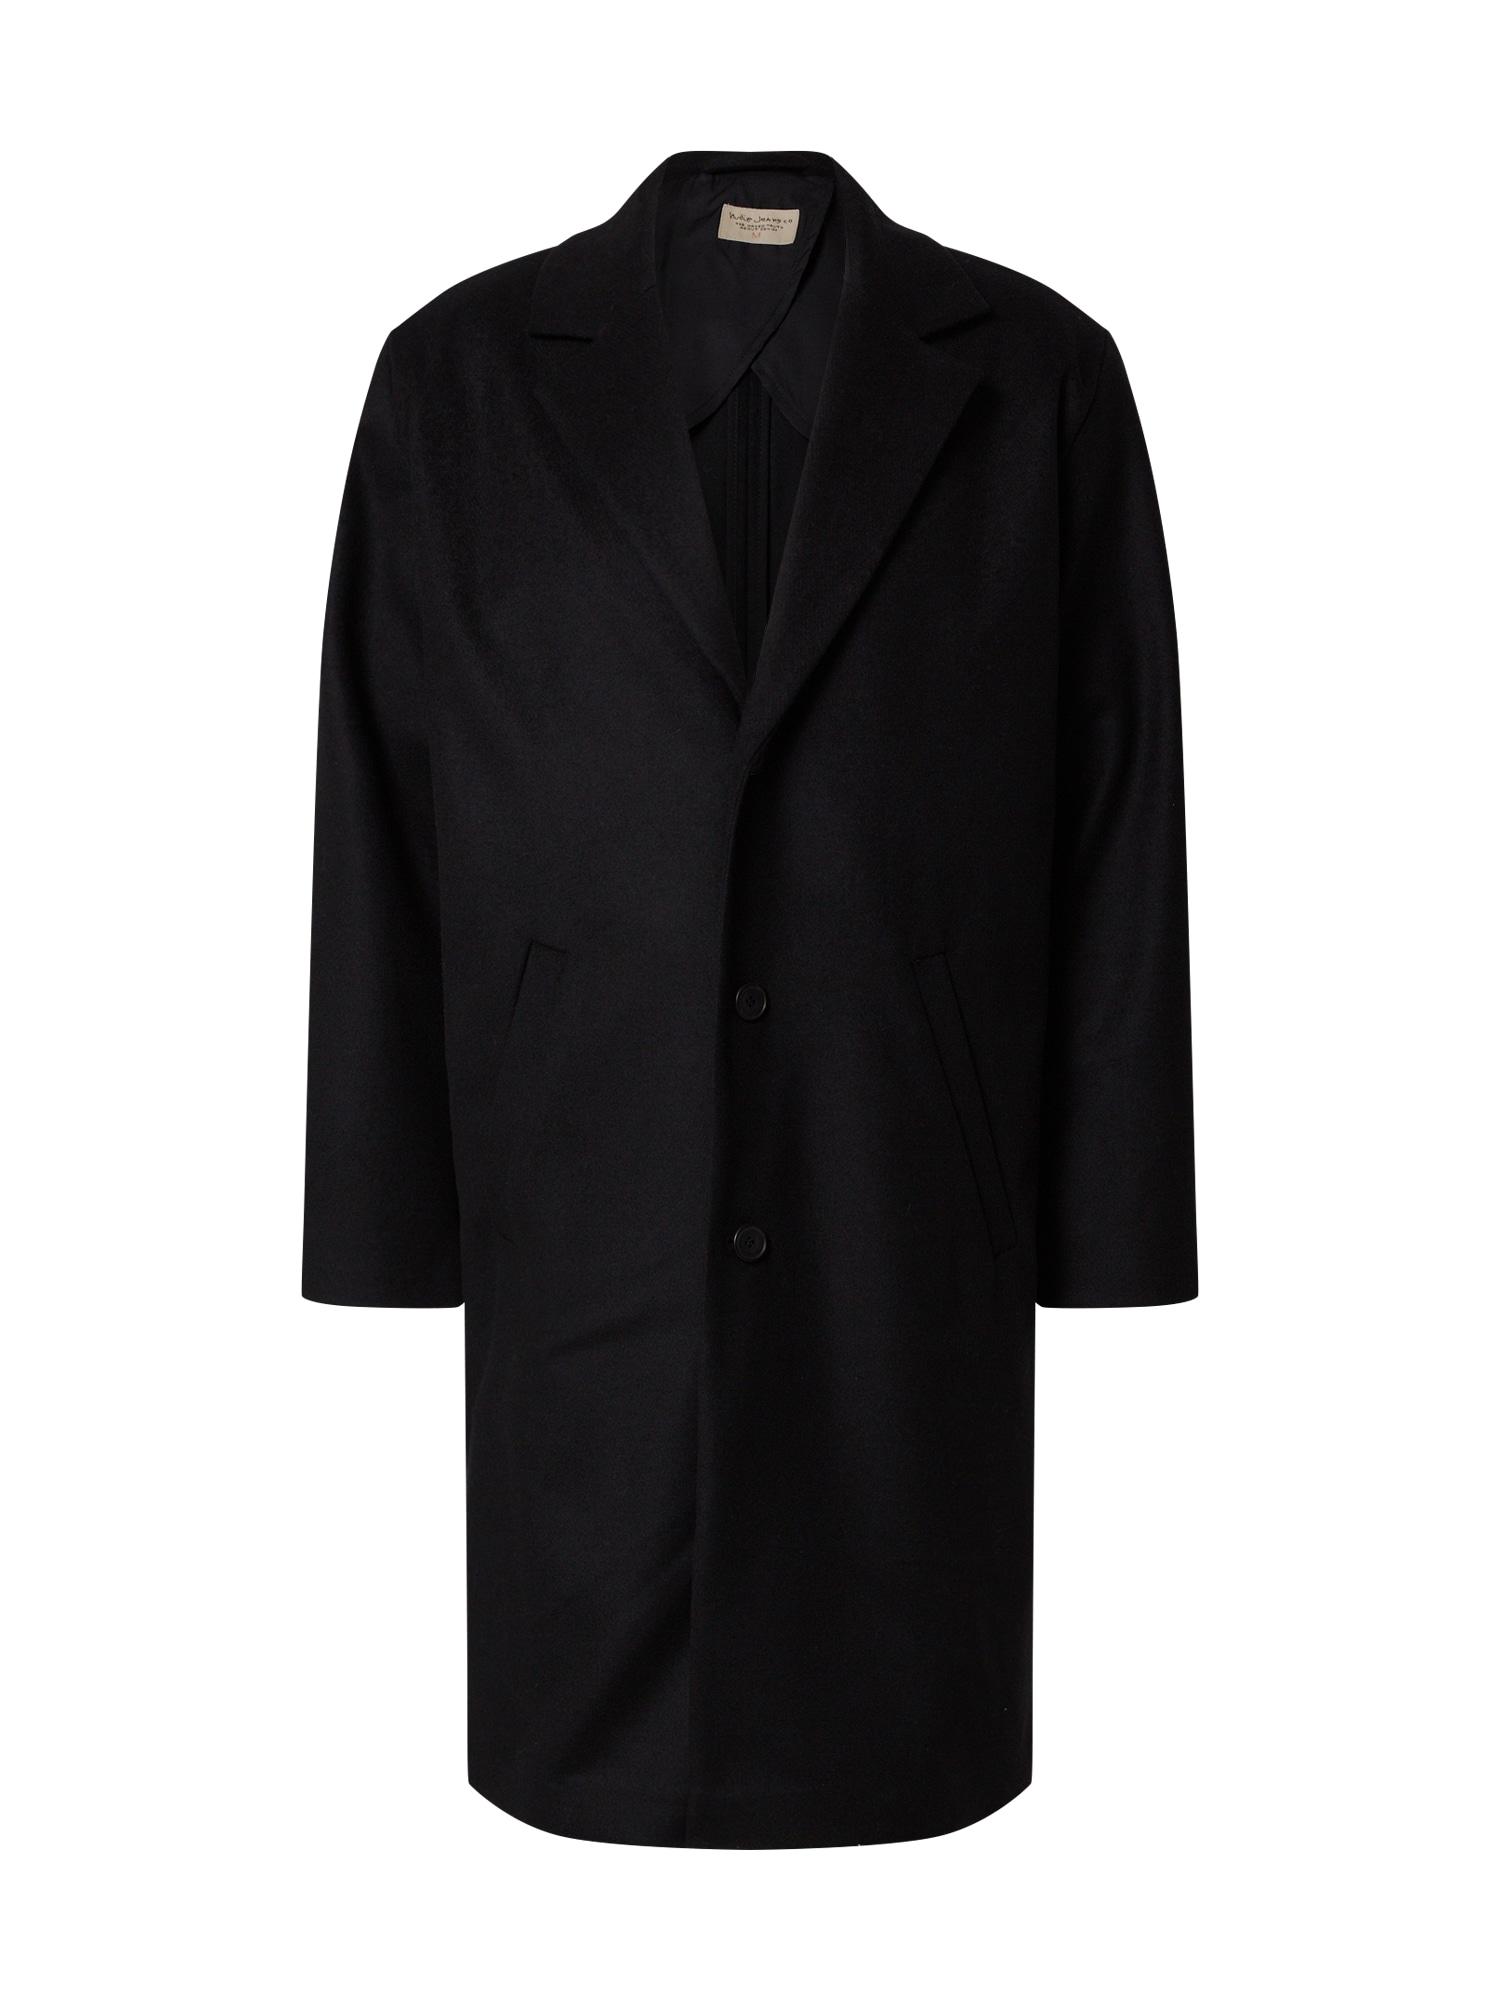 Nudie Jeans Co Demisezoninis paltas 'Ruben' juoda